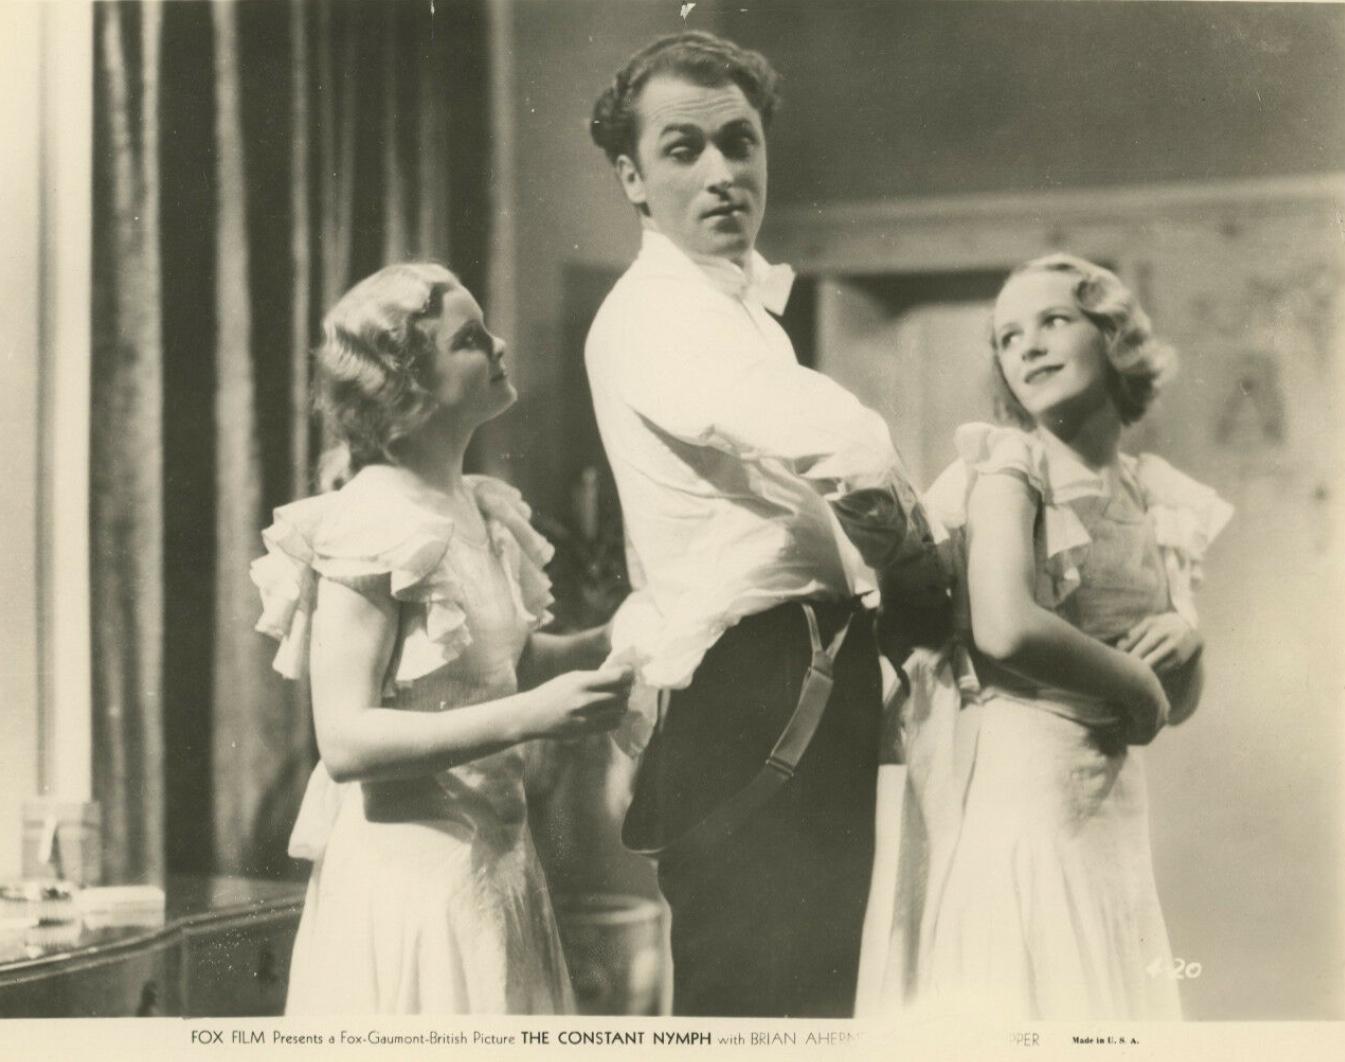 Brian Aherne, Leonora Corbett, and Victoria Hopper in The Constant Nymph (1933)